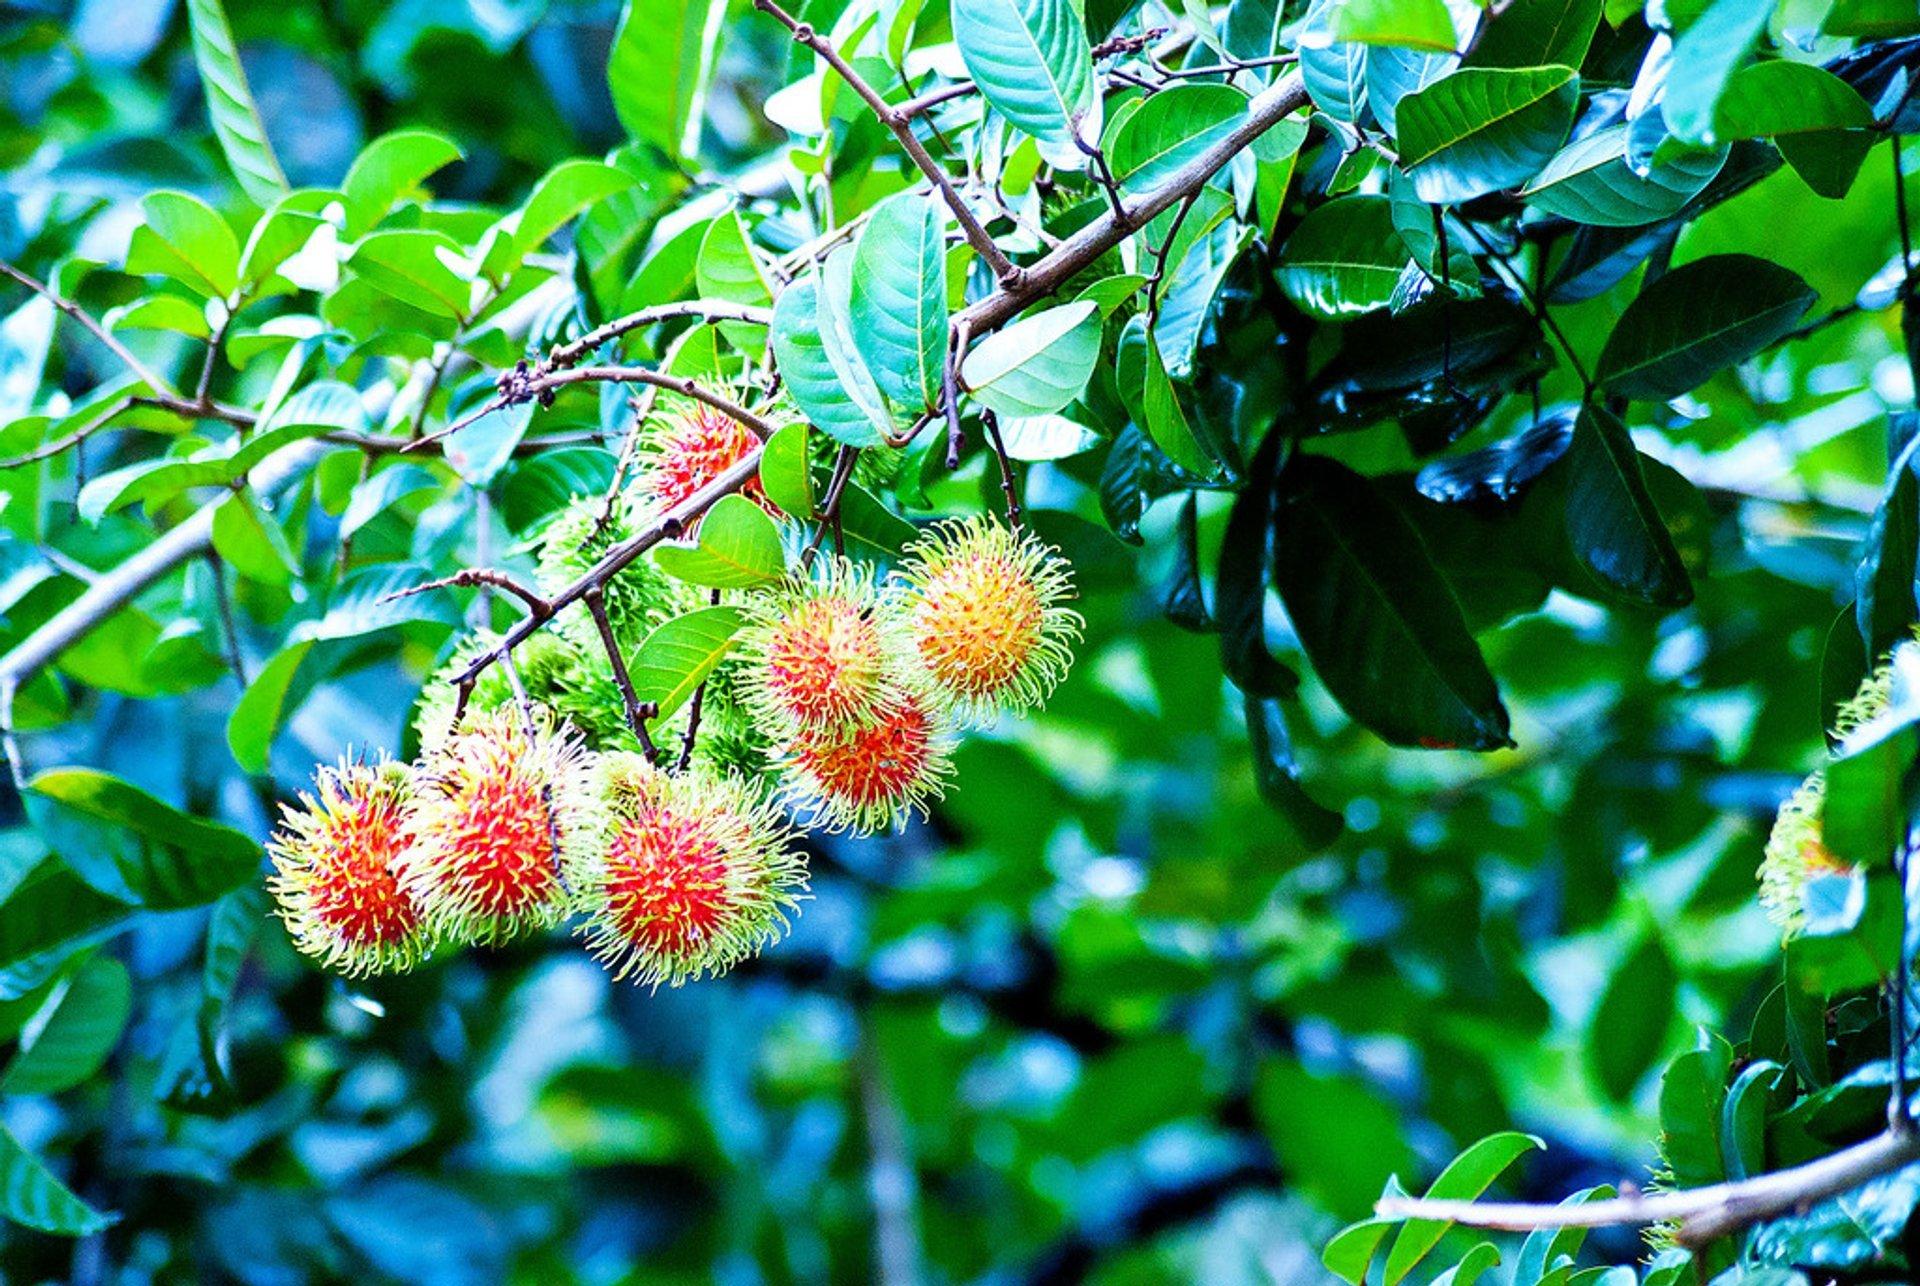 Rambutan in Honduras - Best Time